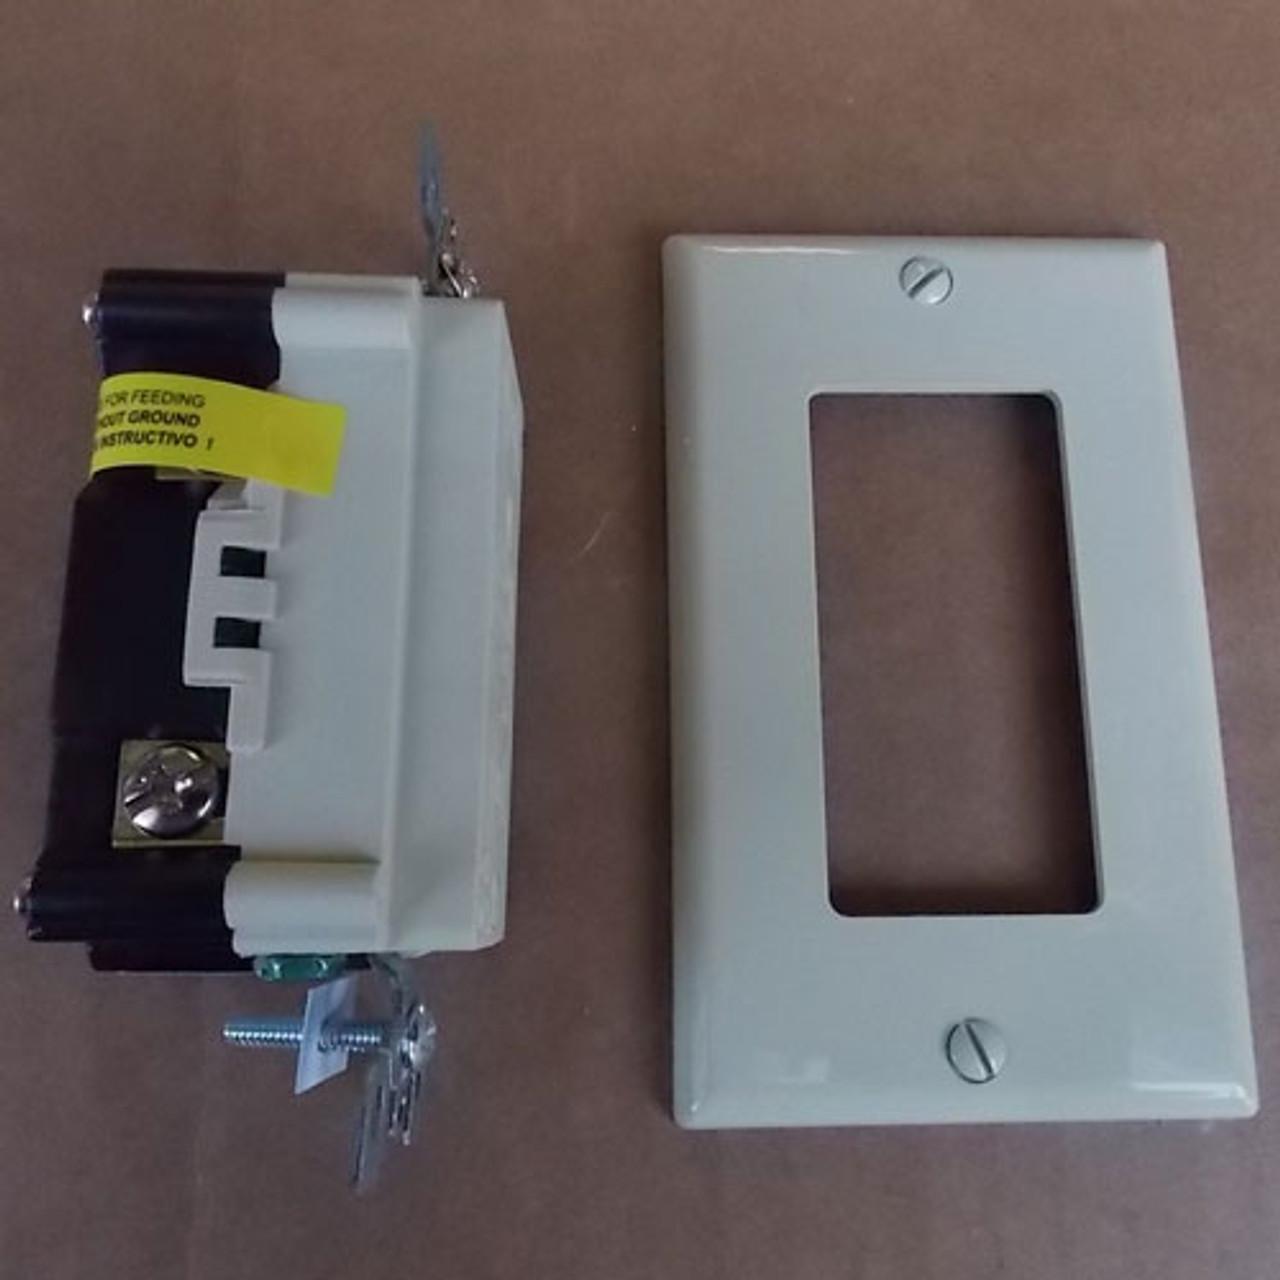 Leviton T7899-I Smartlock Pro GFCI Tamper Resistant Lighted Receptacle 20A